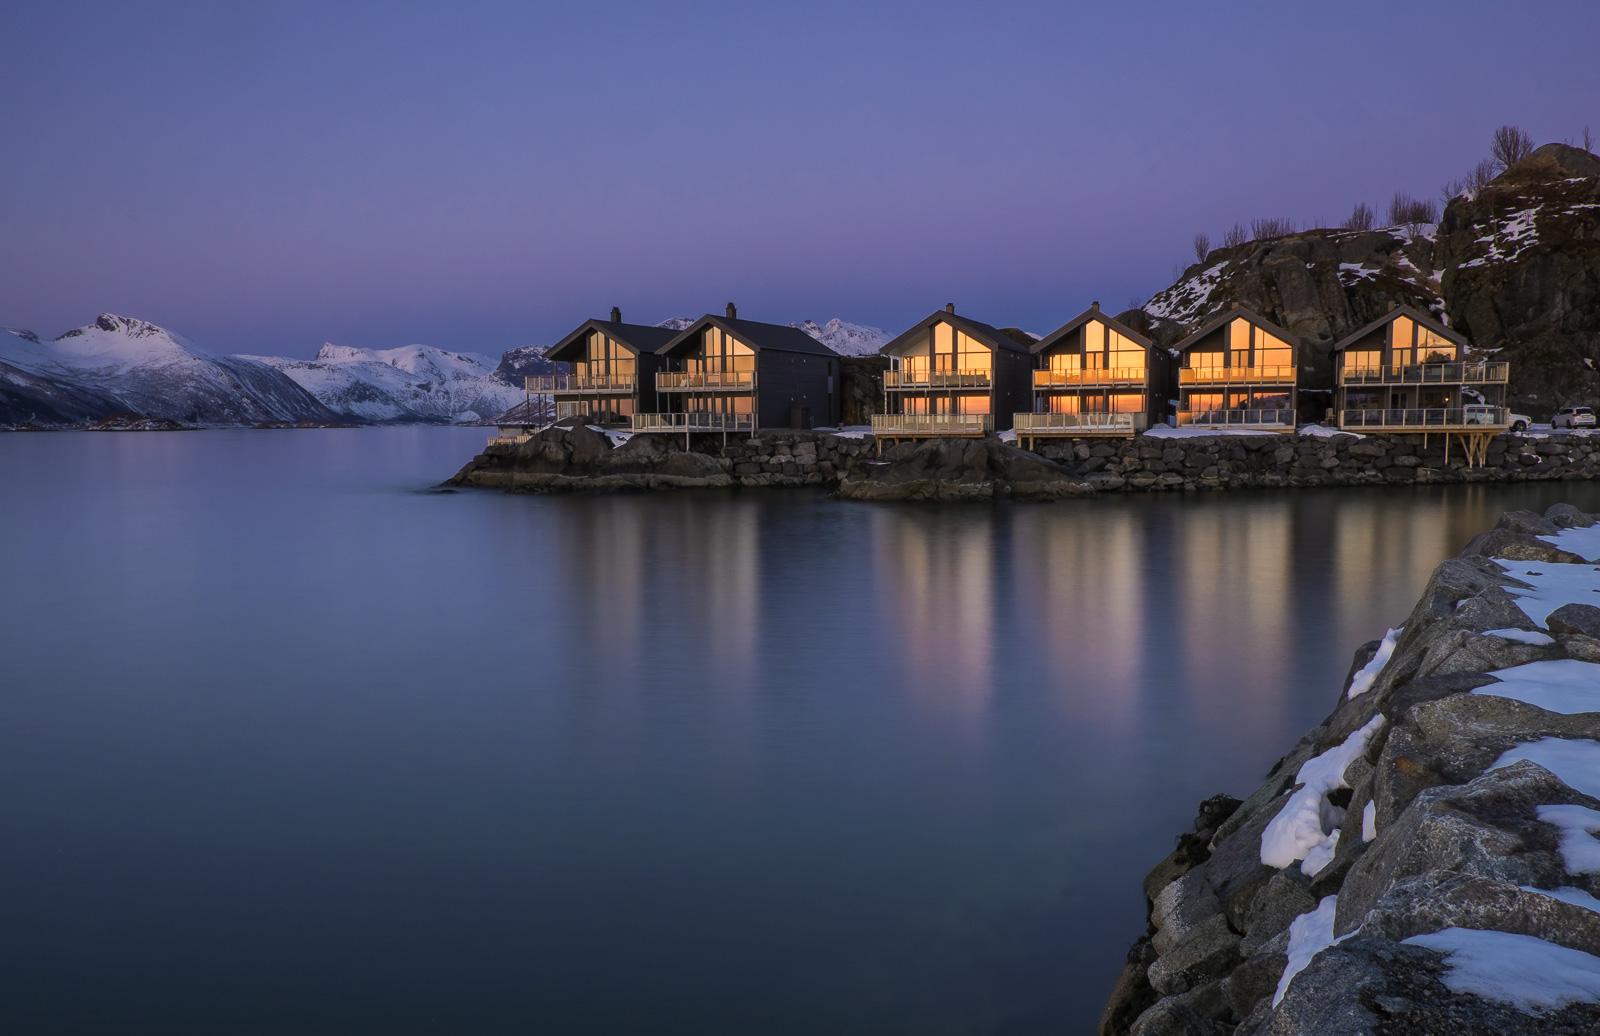 Reflected Afterglow, Hamn i Senja, Senja, Norway, dusk, twilit, blue, deep, electric, sunset, glass, harbour, chalets  , photo